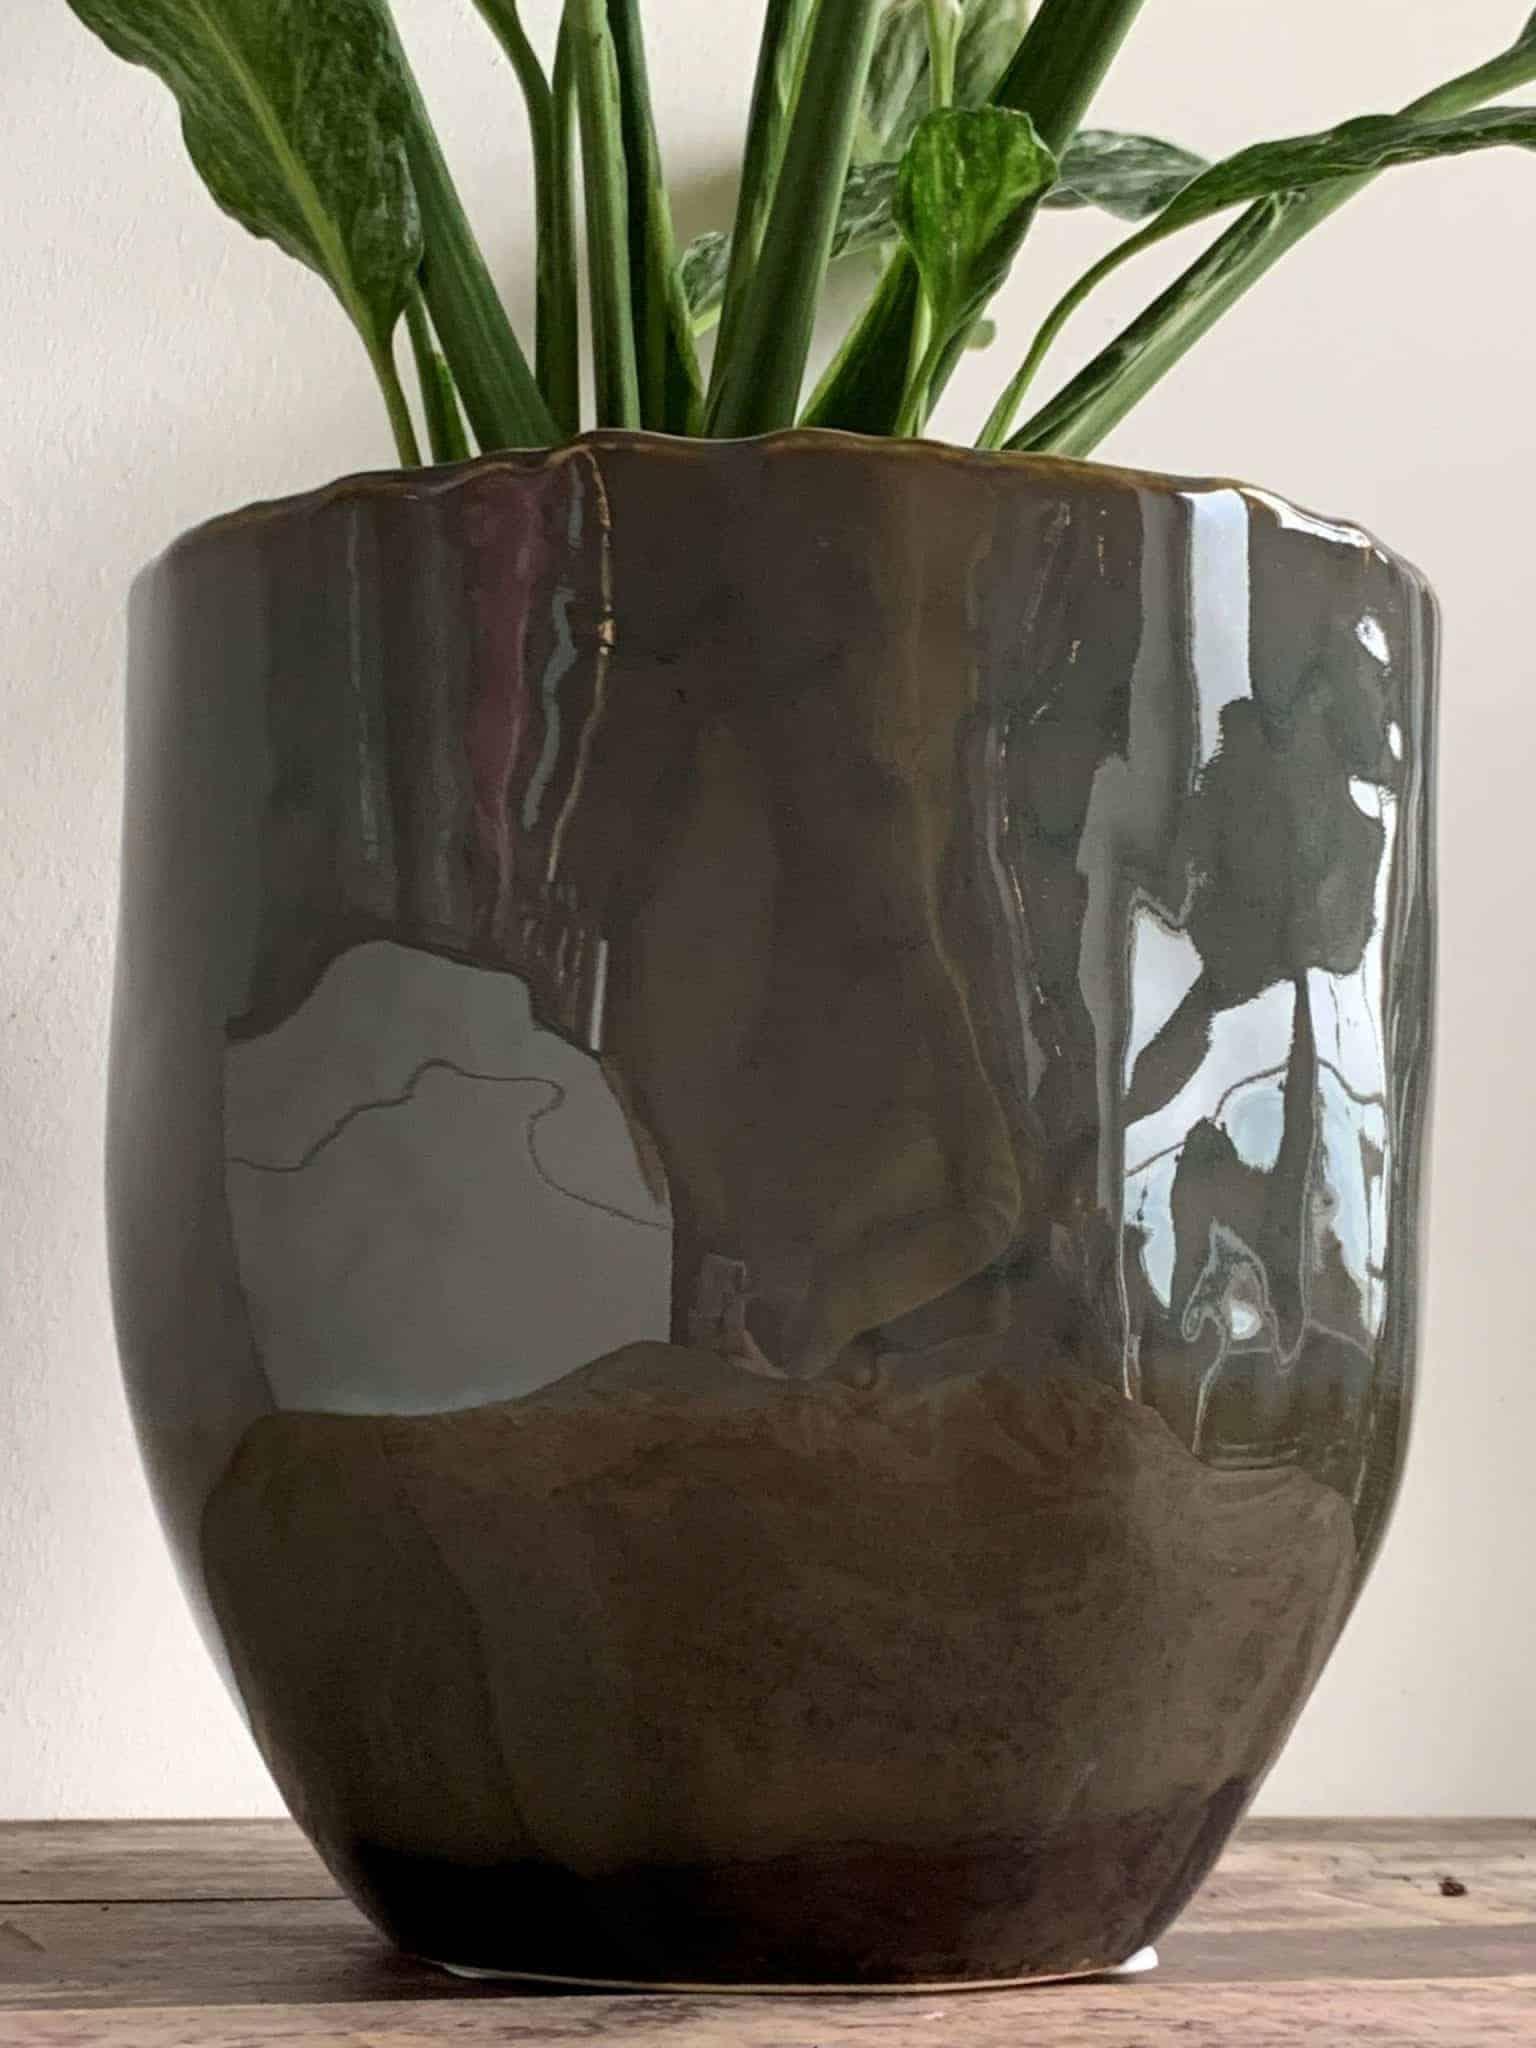 Mestre planter for up to 14cm pots